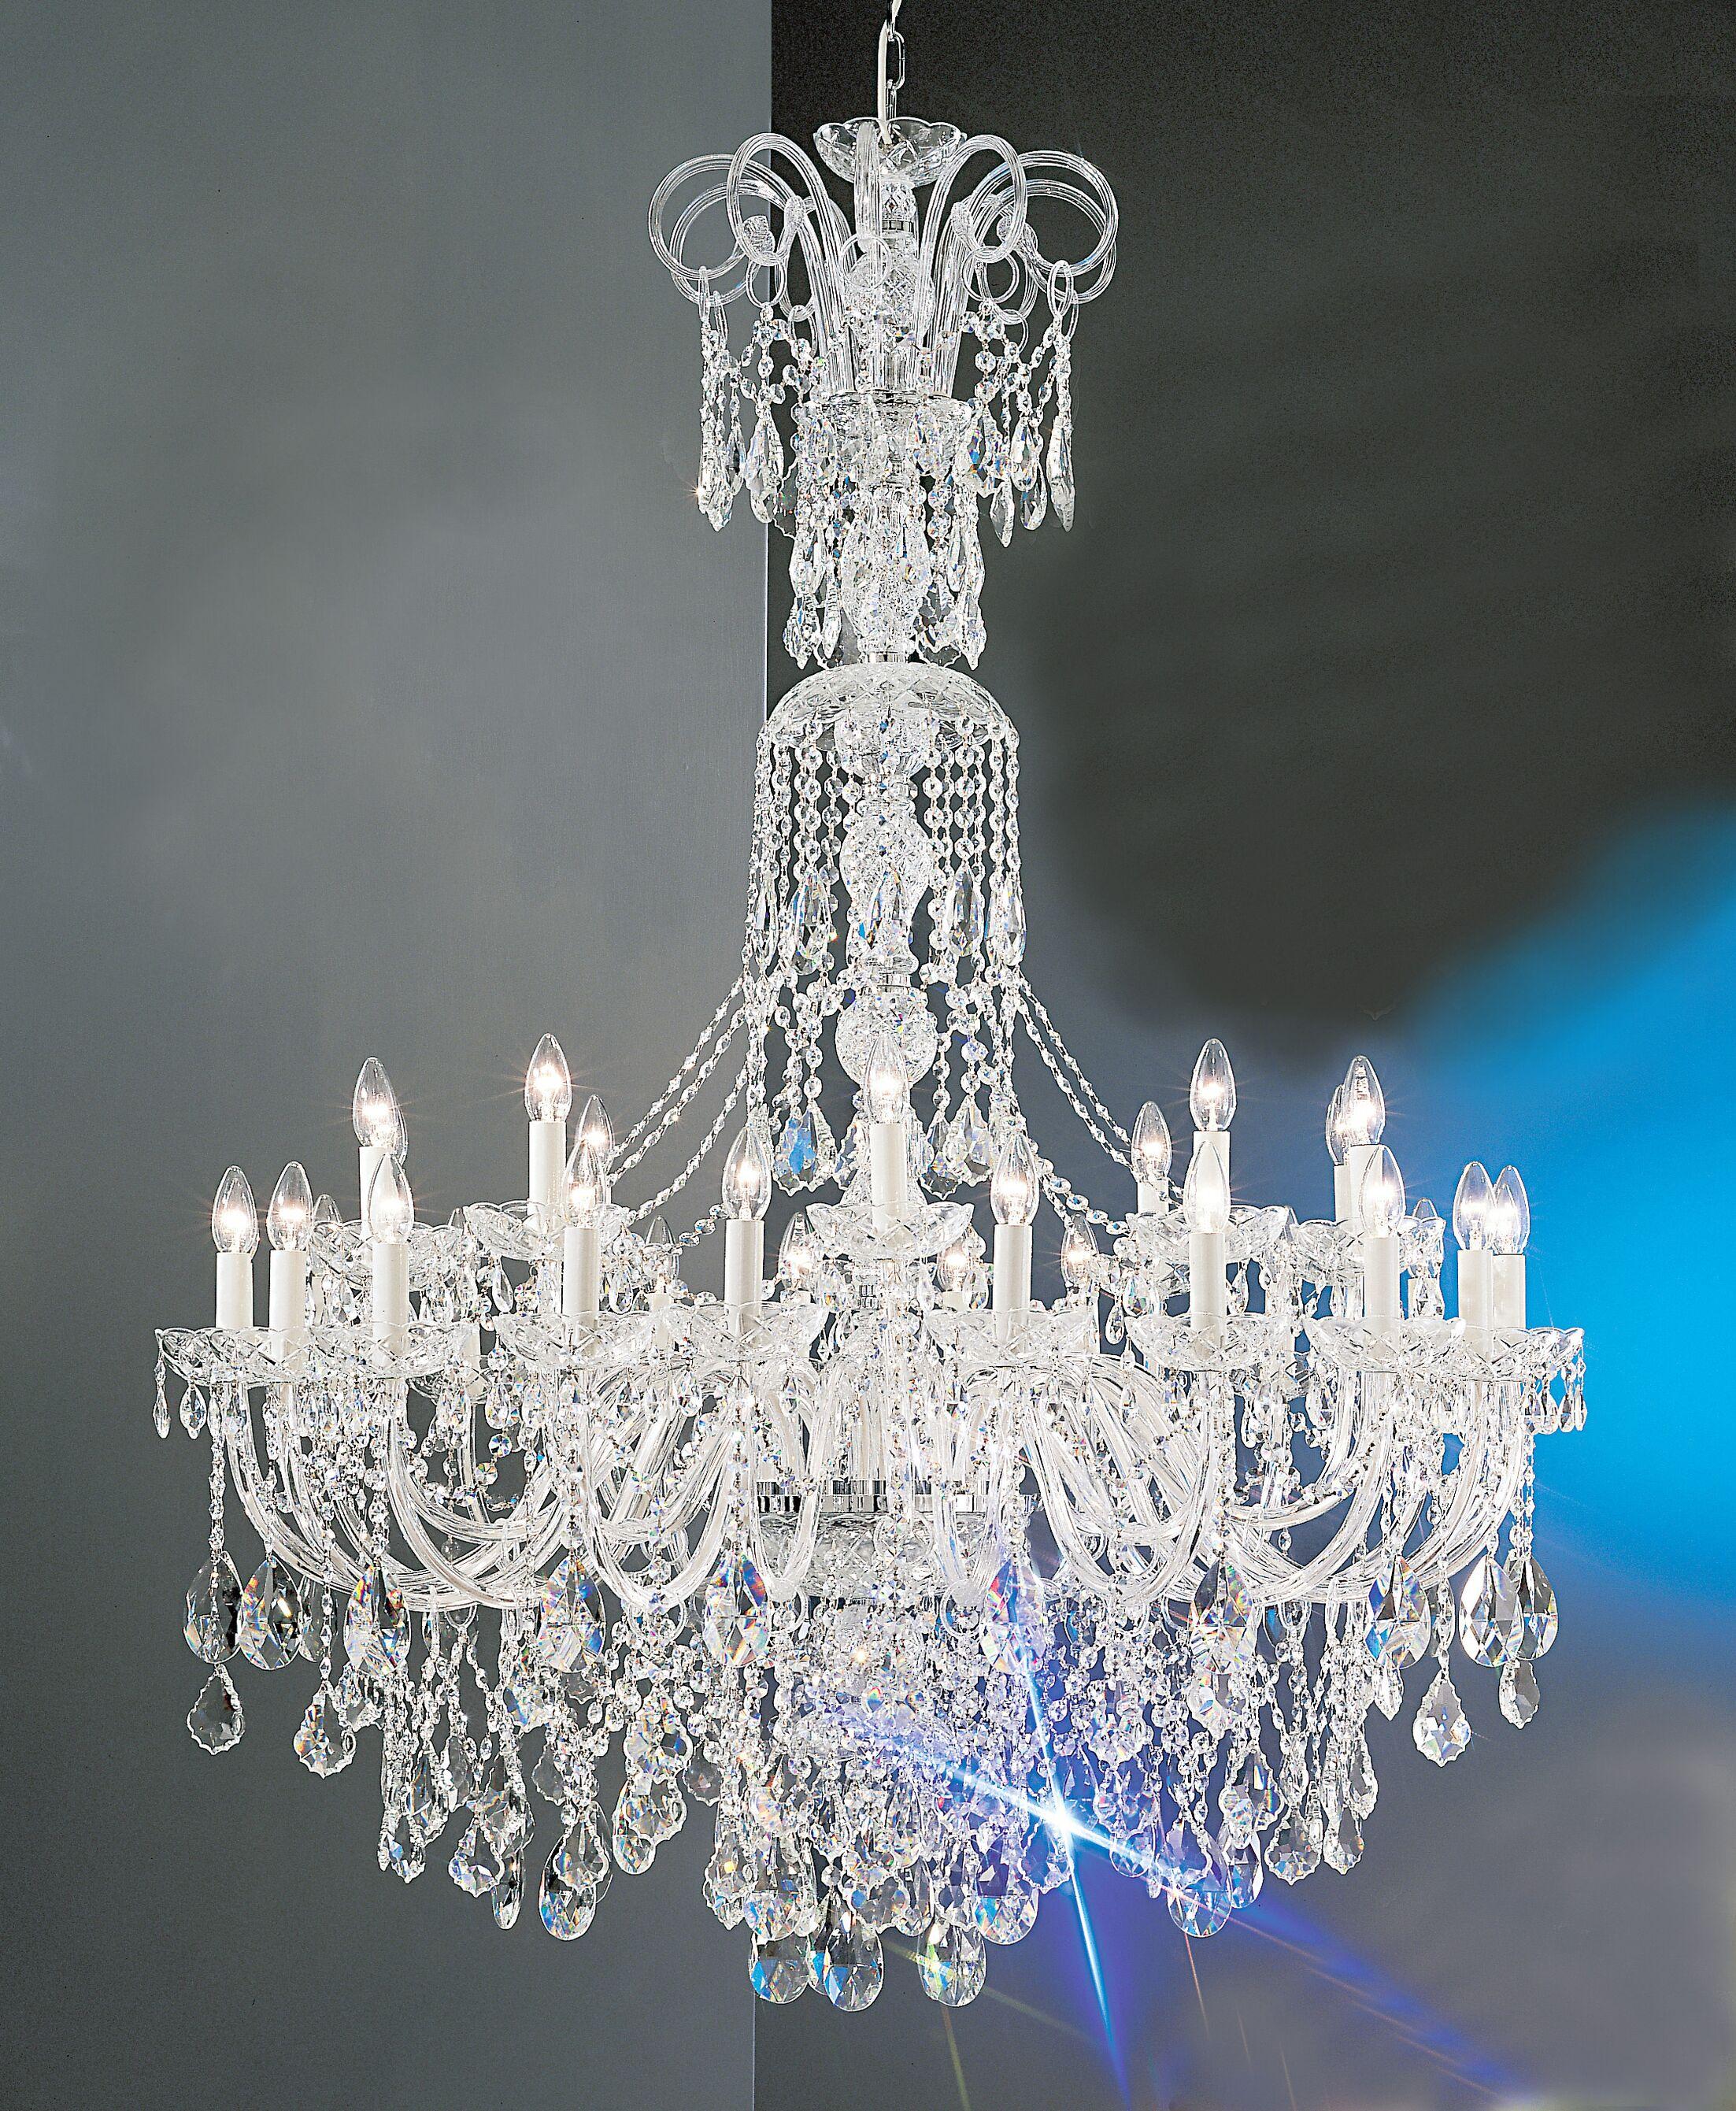 Bohemia 30-Light Candle Style Chandelier Crystal Type: Swarovski Elements, Finish: 24K Gold Plate